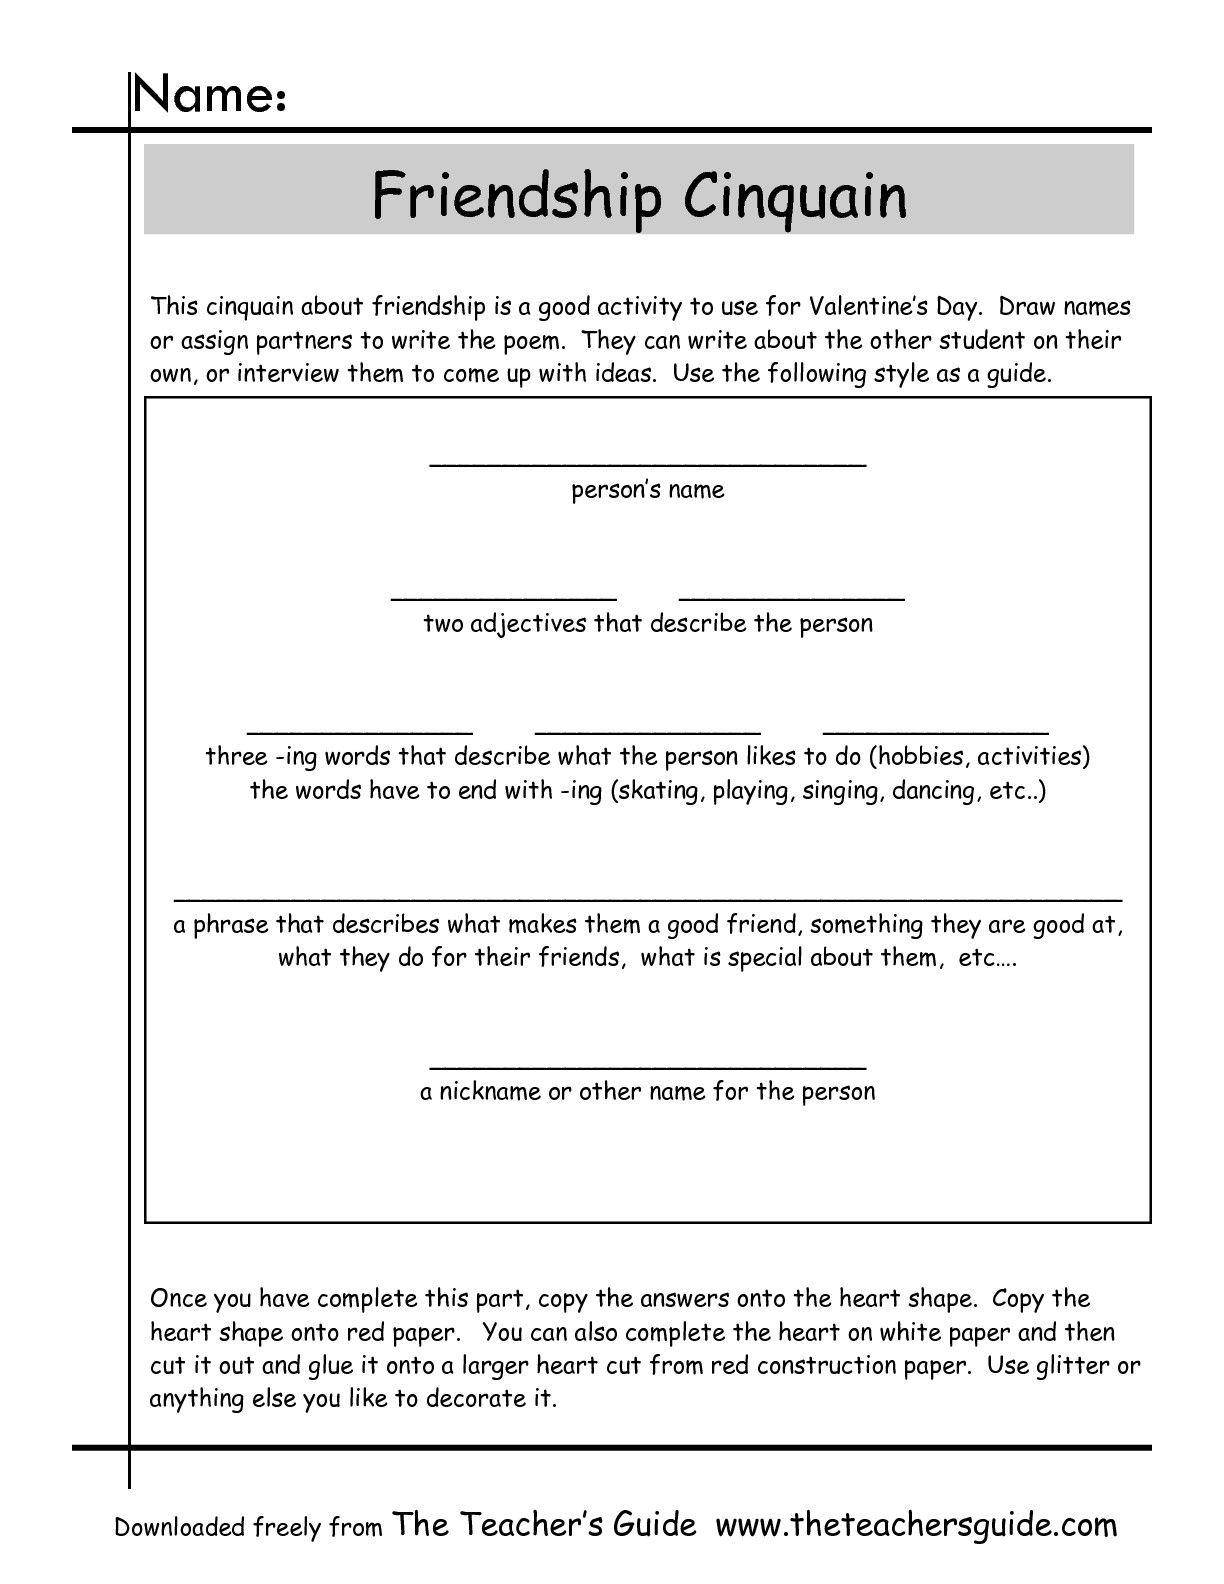 Friendship Cinquain Worksheet